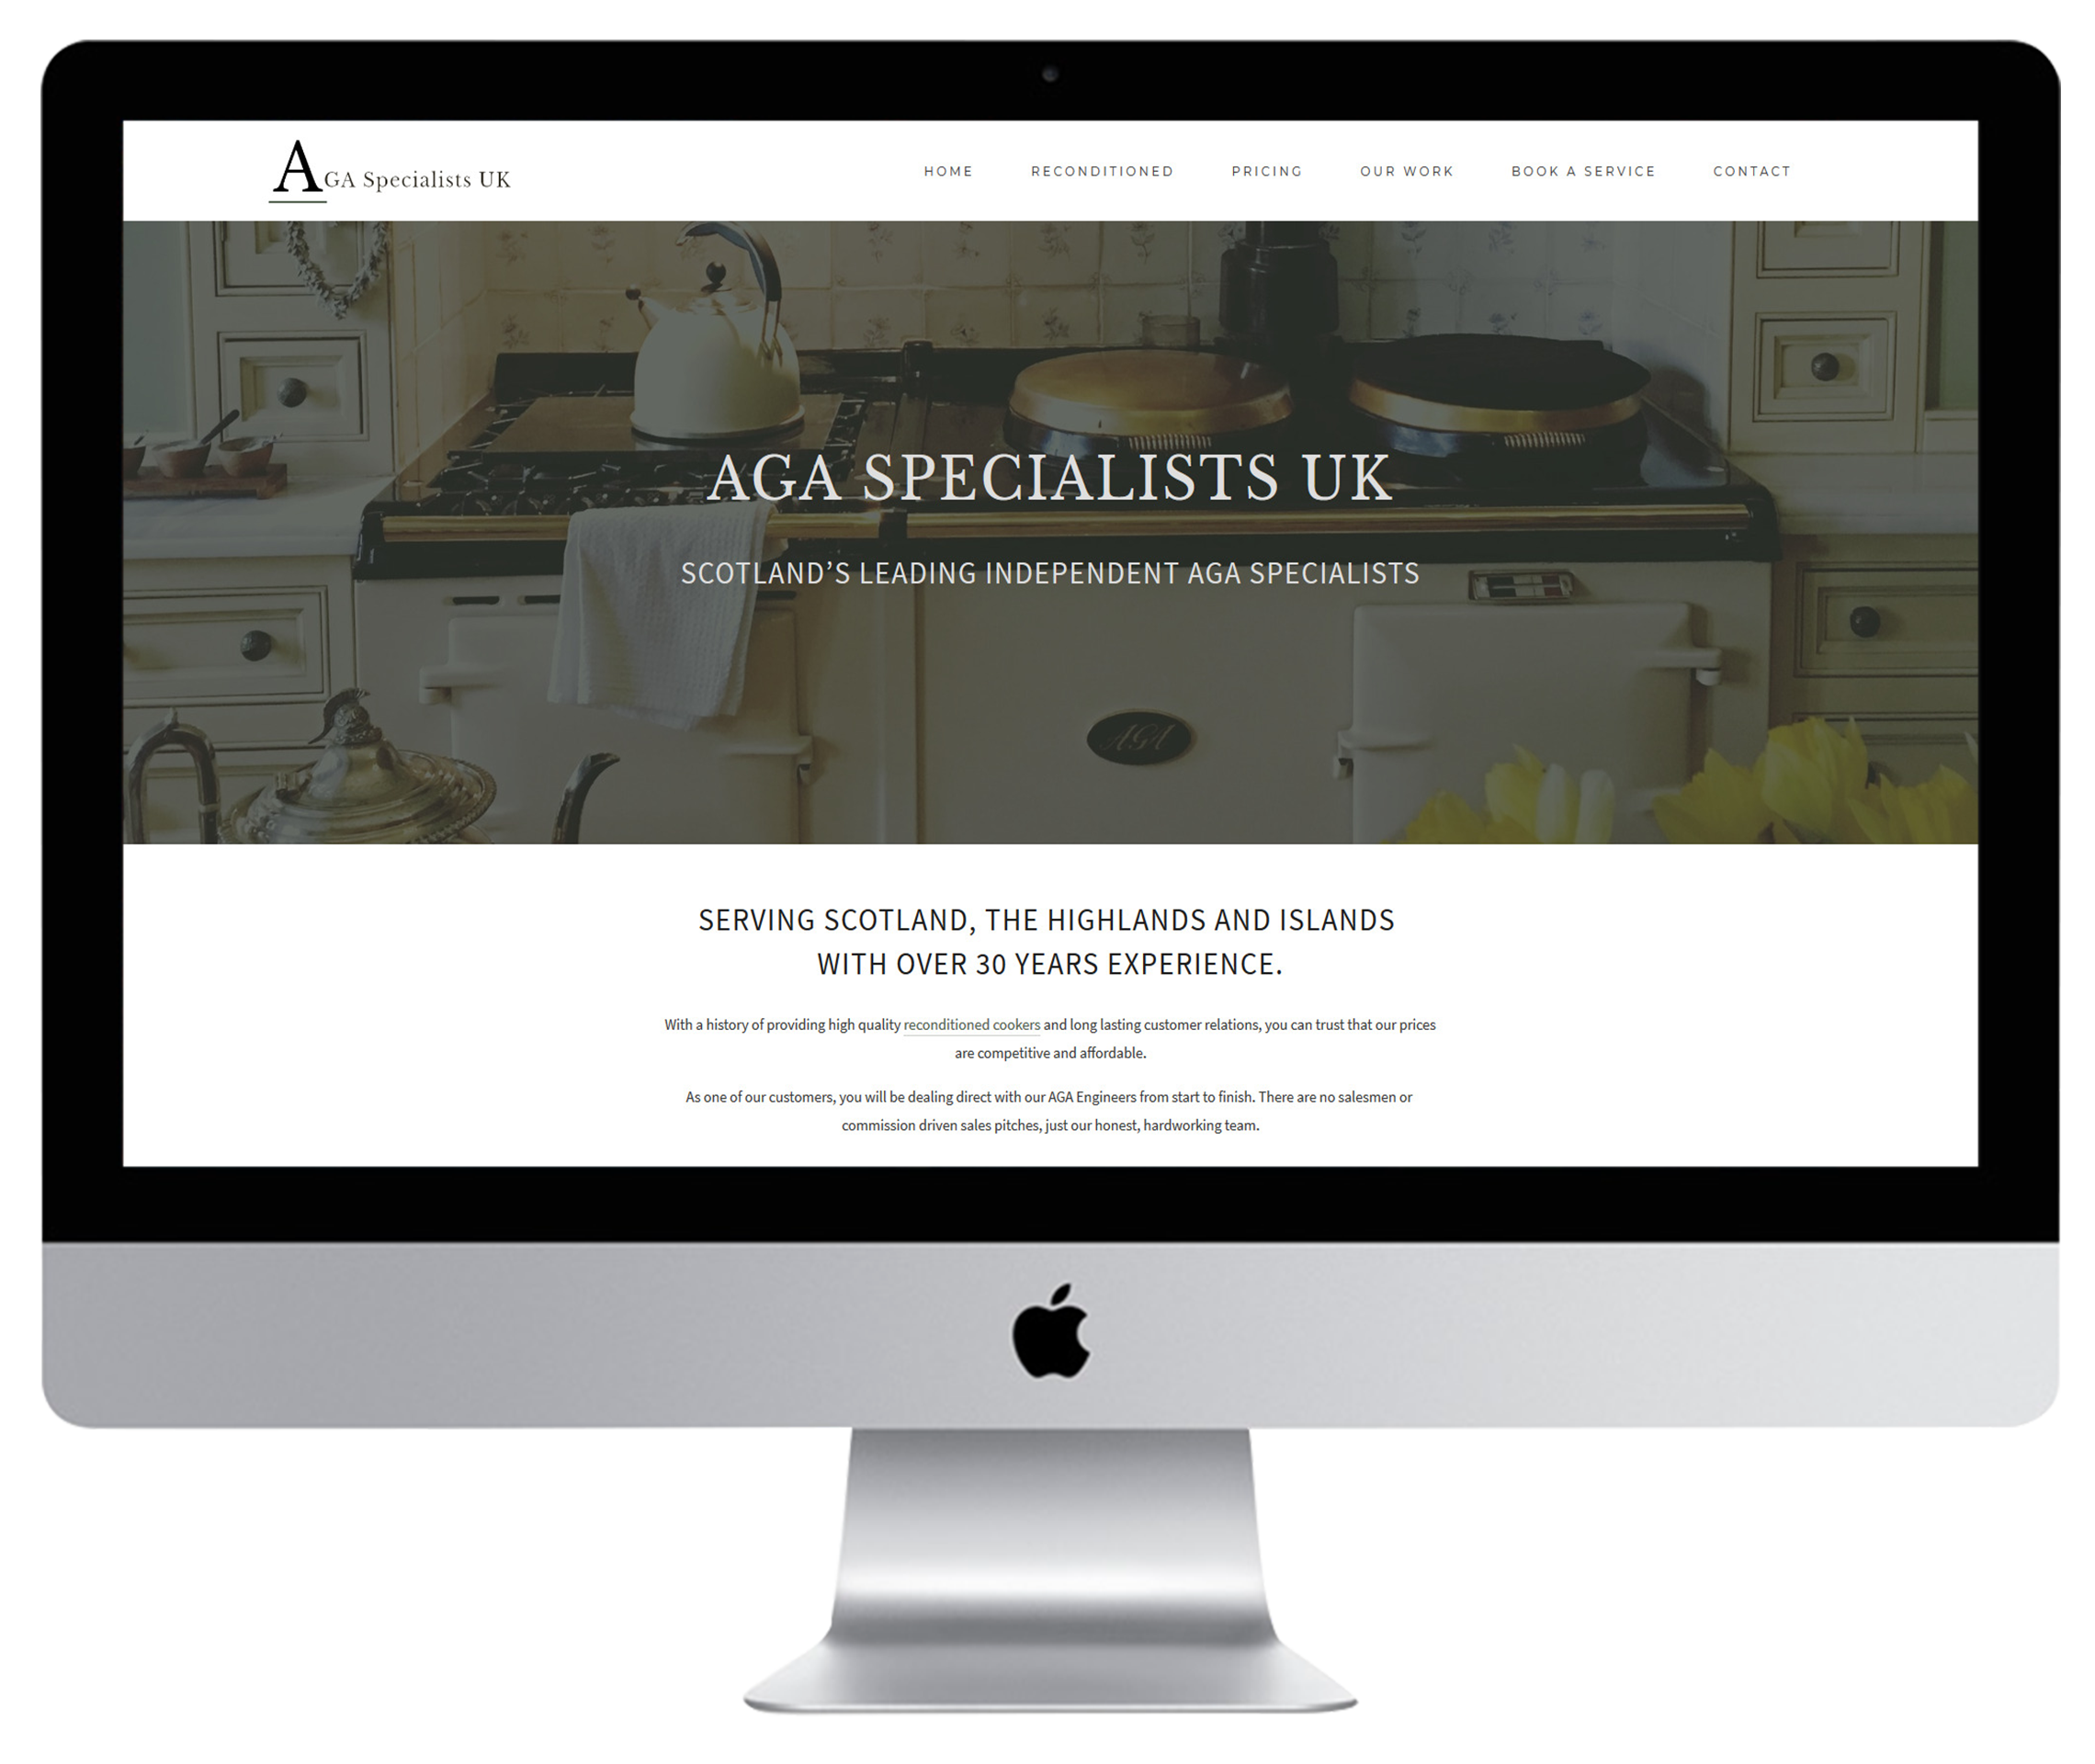 AGA Specialists UK - Squarespace Web Design UK Redesign.